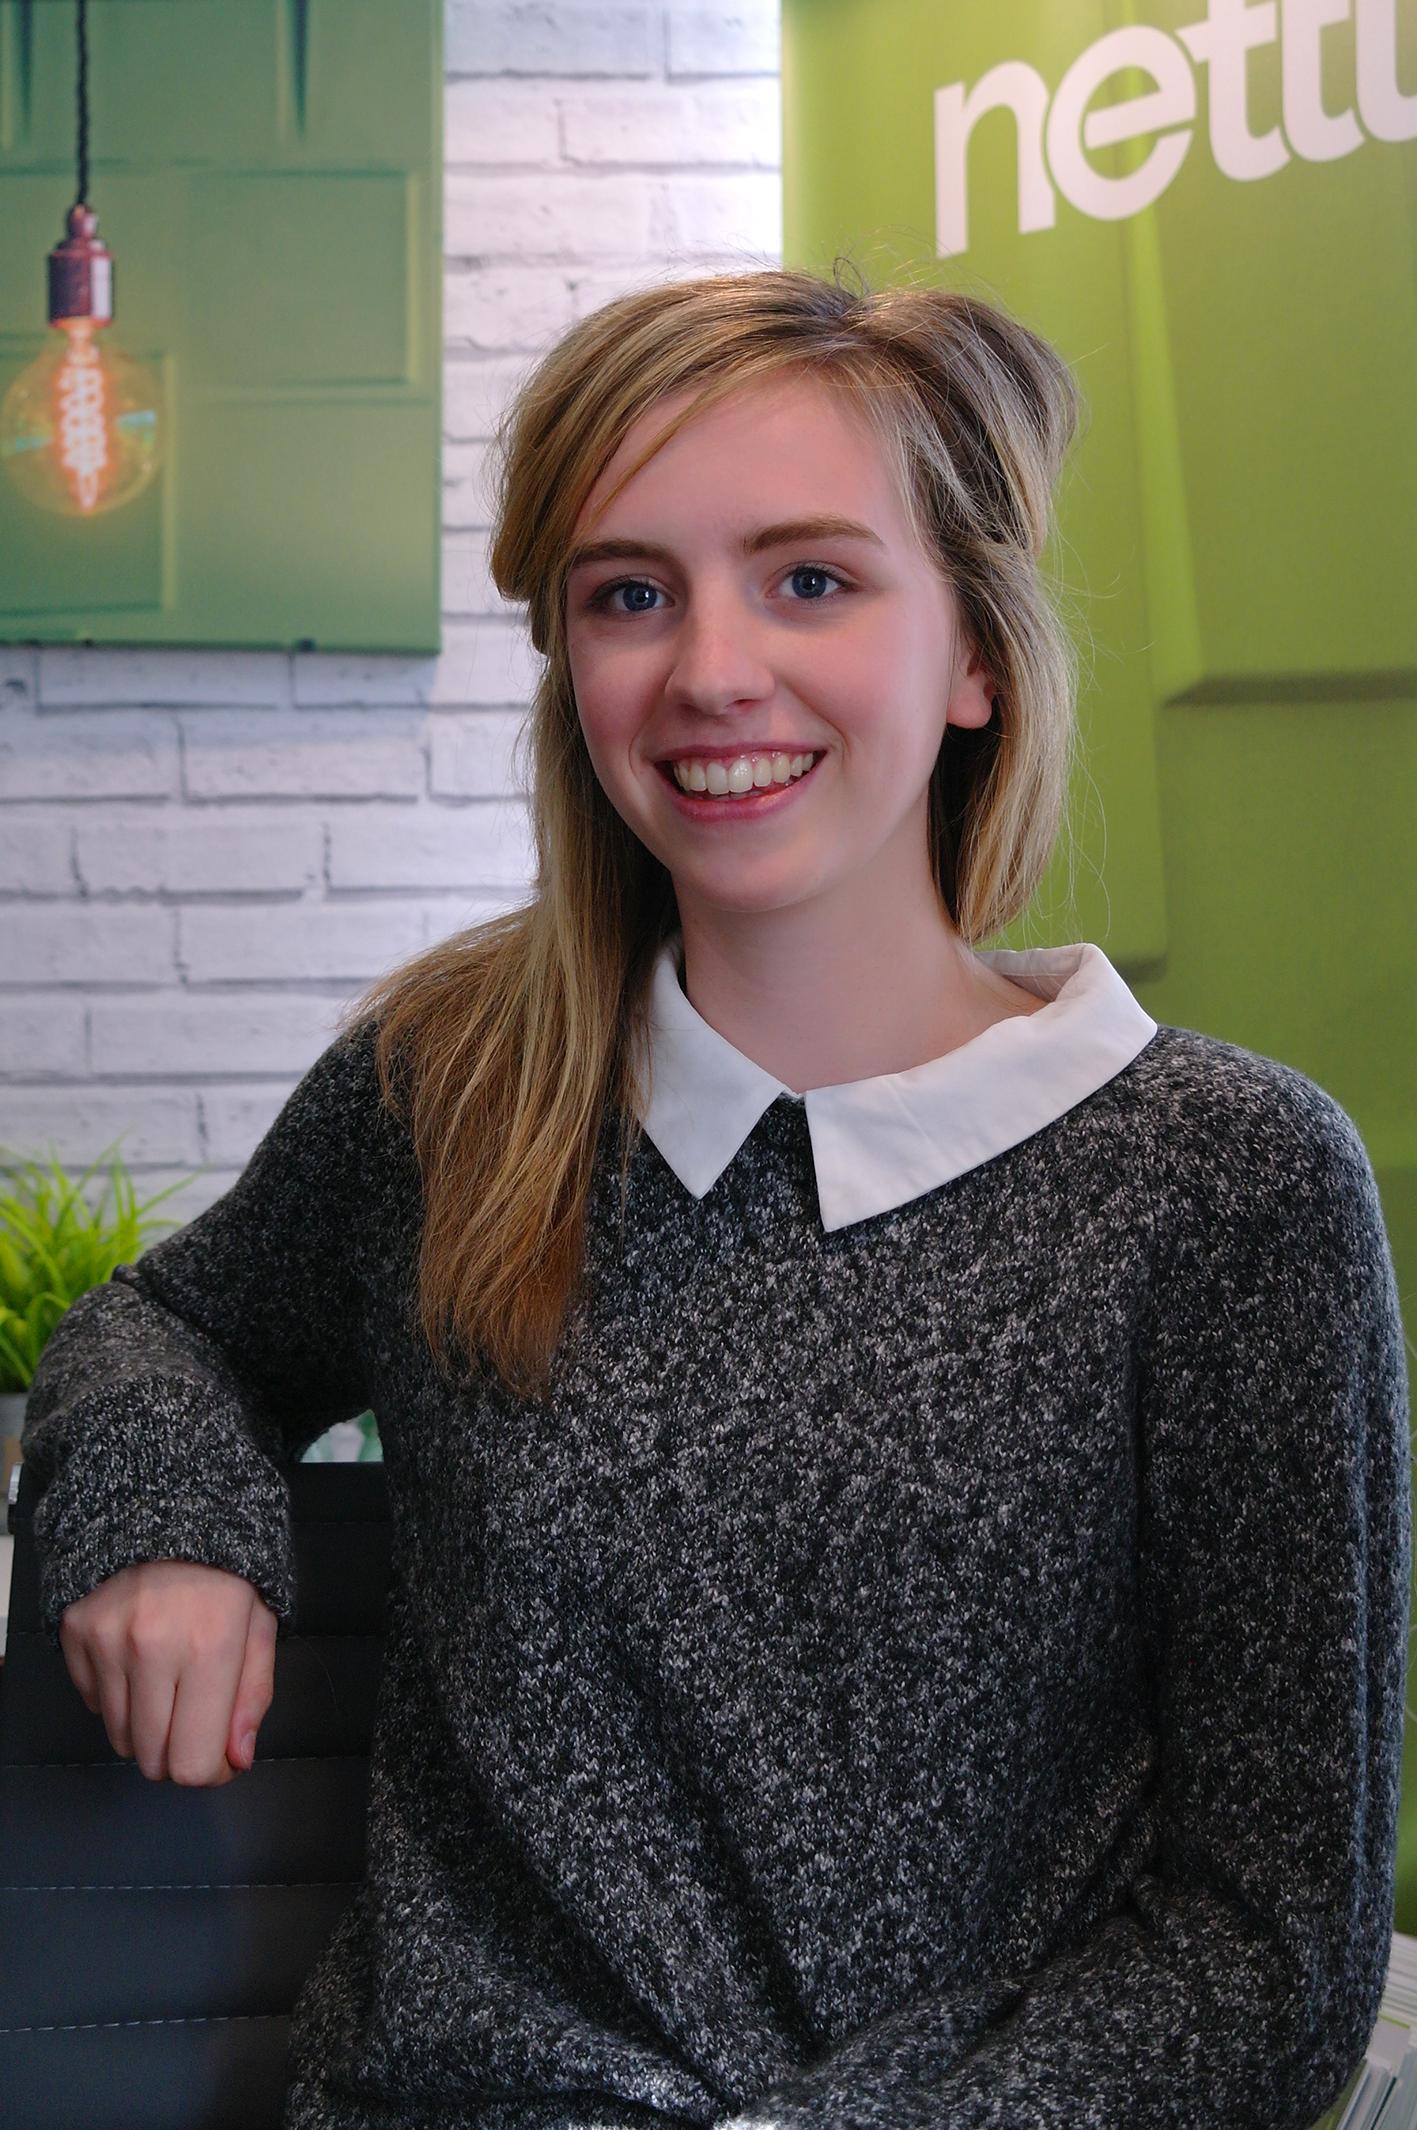 Katie Moraity